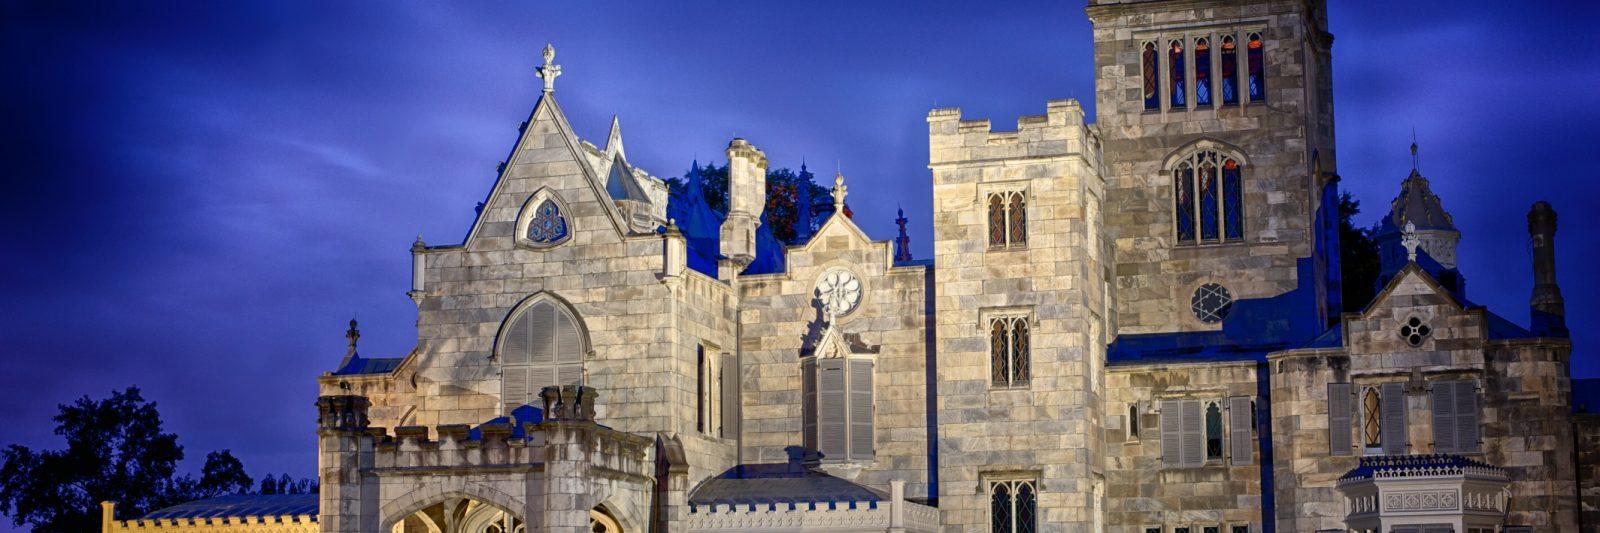 Lyndhurst mansion appears against a moody dark blue sky.